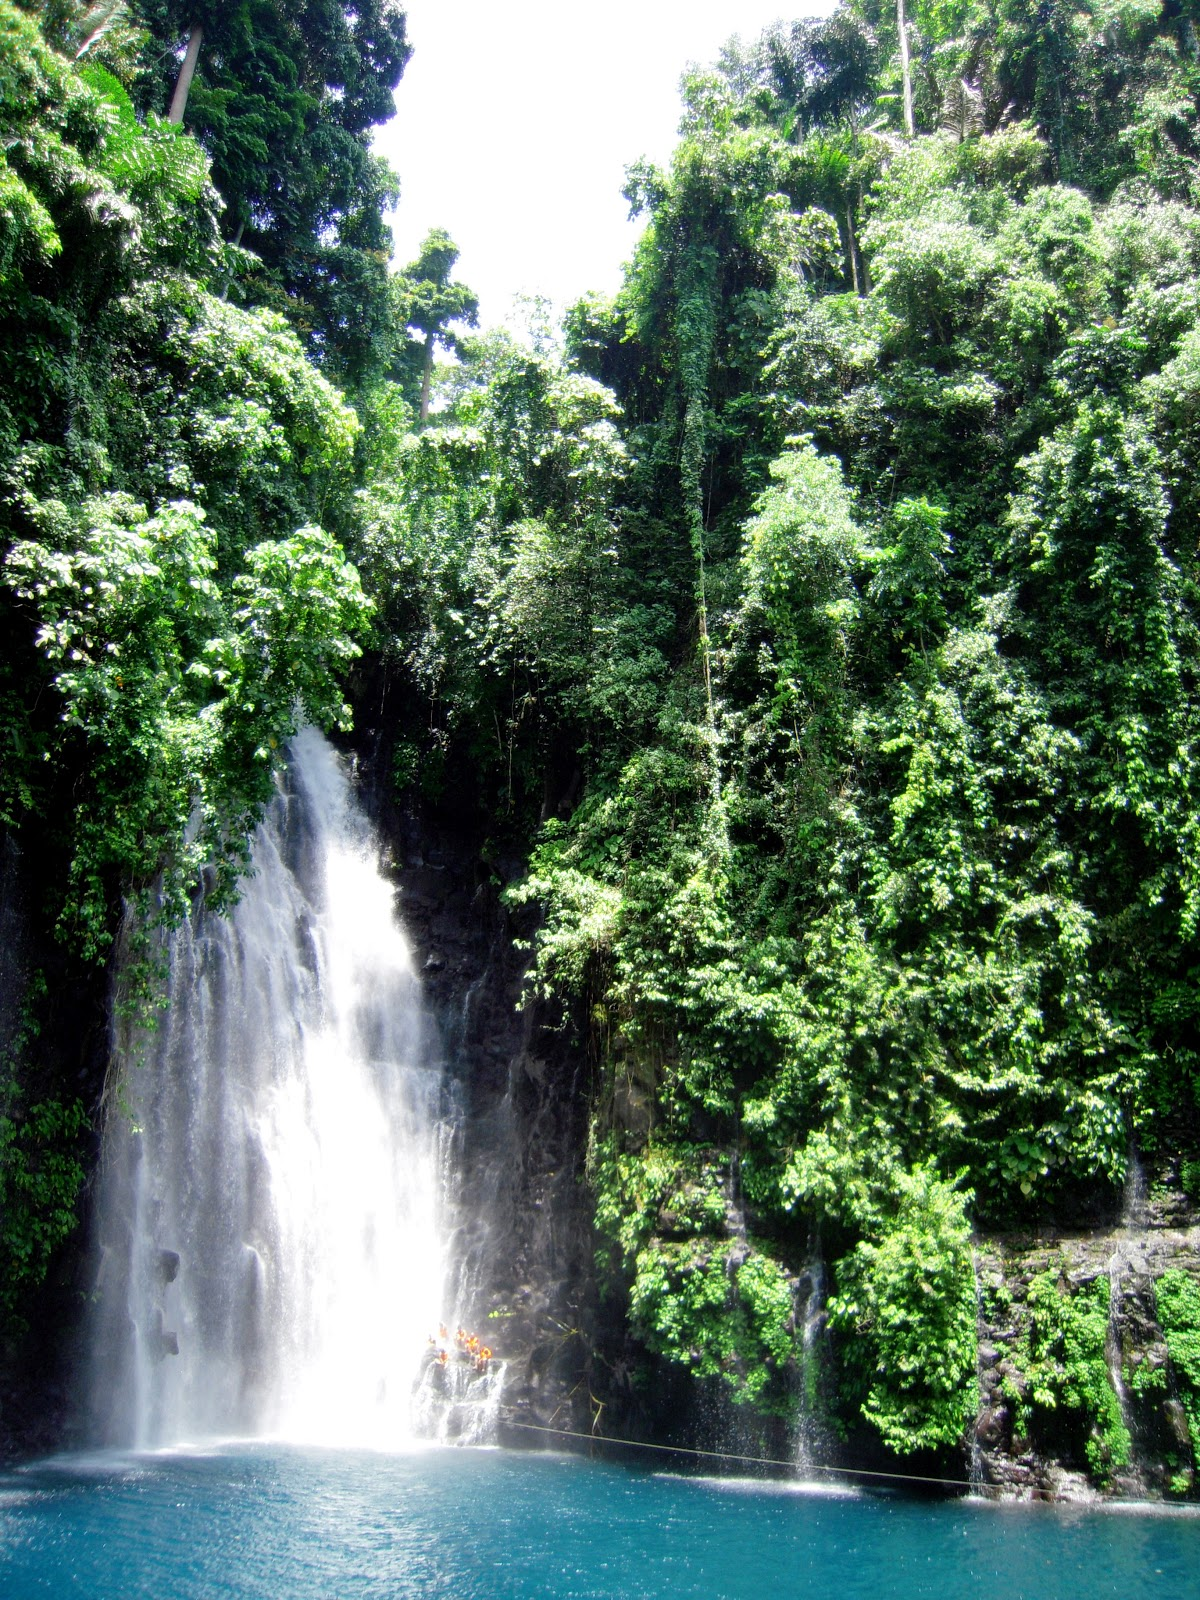 iligan city | tinago falls - pinay travelista